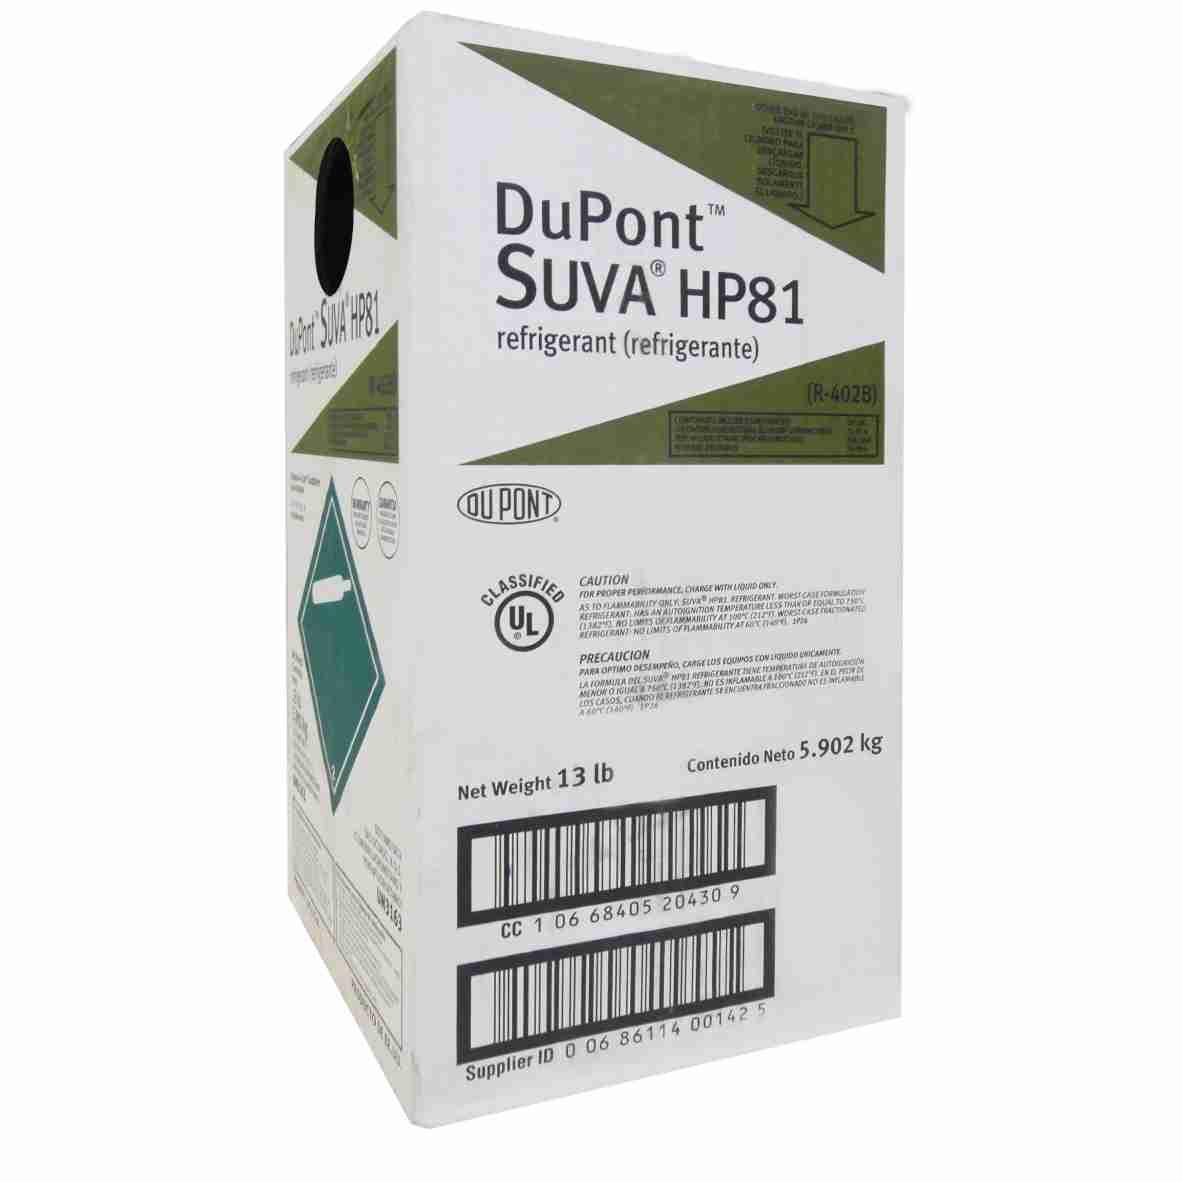 R22 Gas Refrigerante Dupont Garrafa 30lbs 13 6kg Villa Crespo Pictures  #3C6862